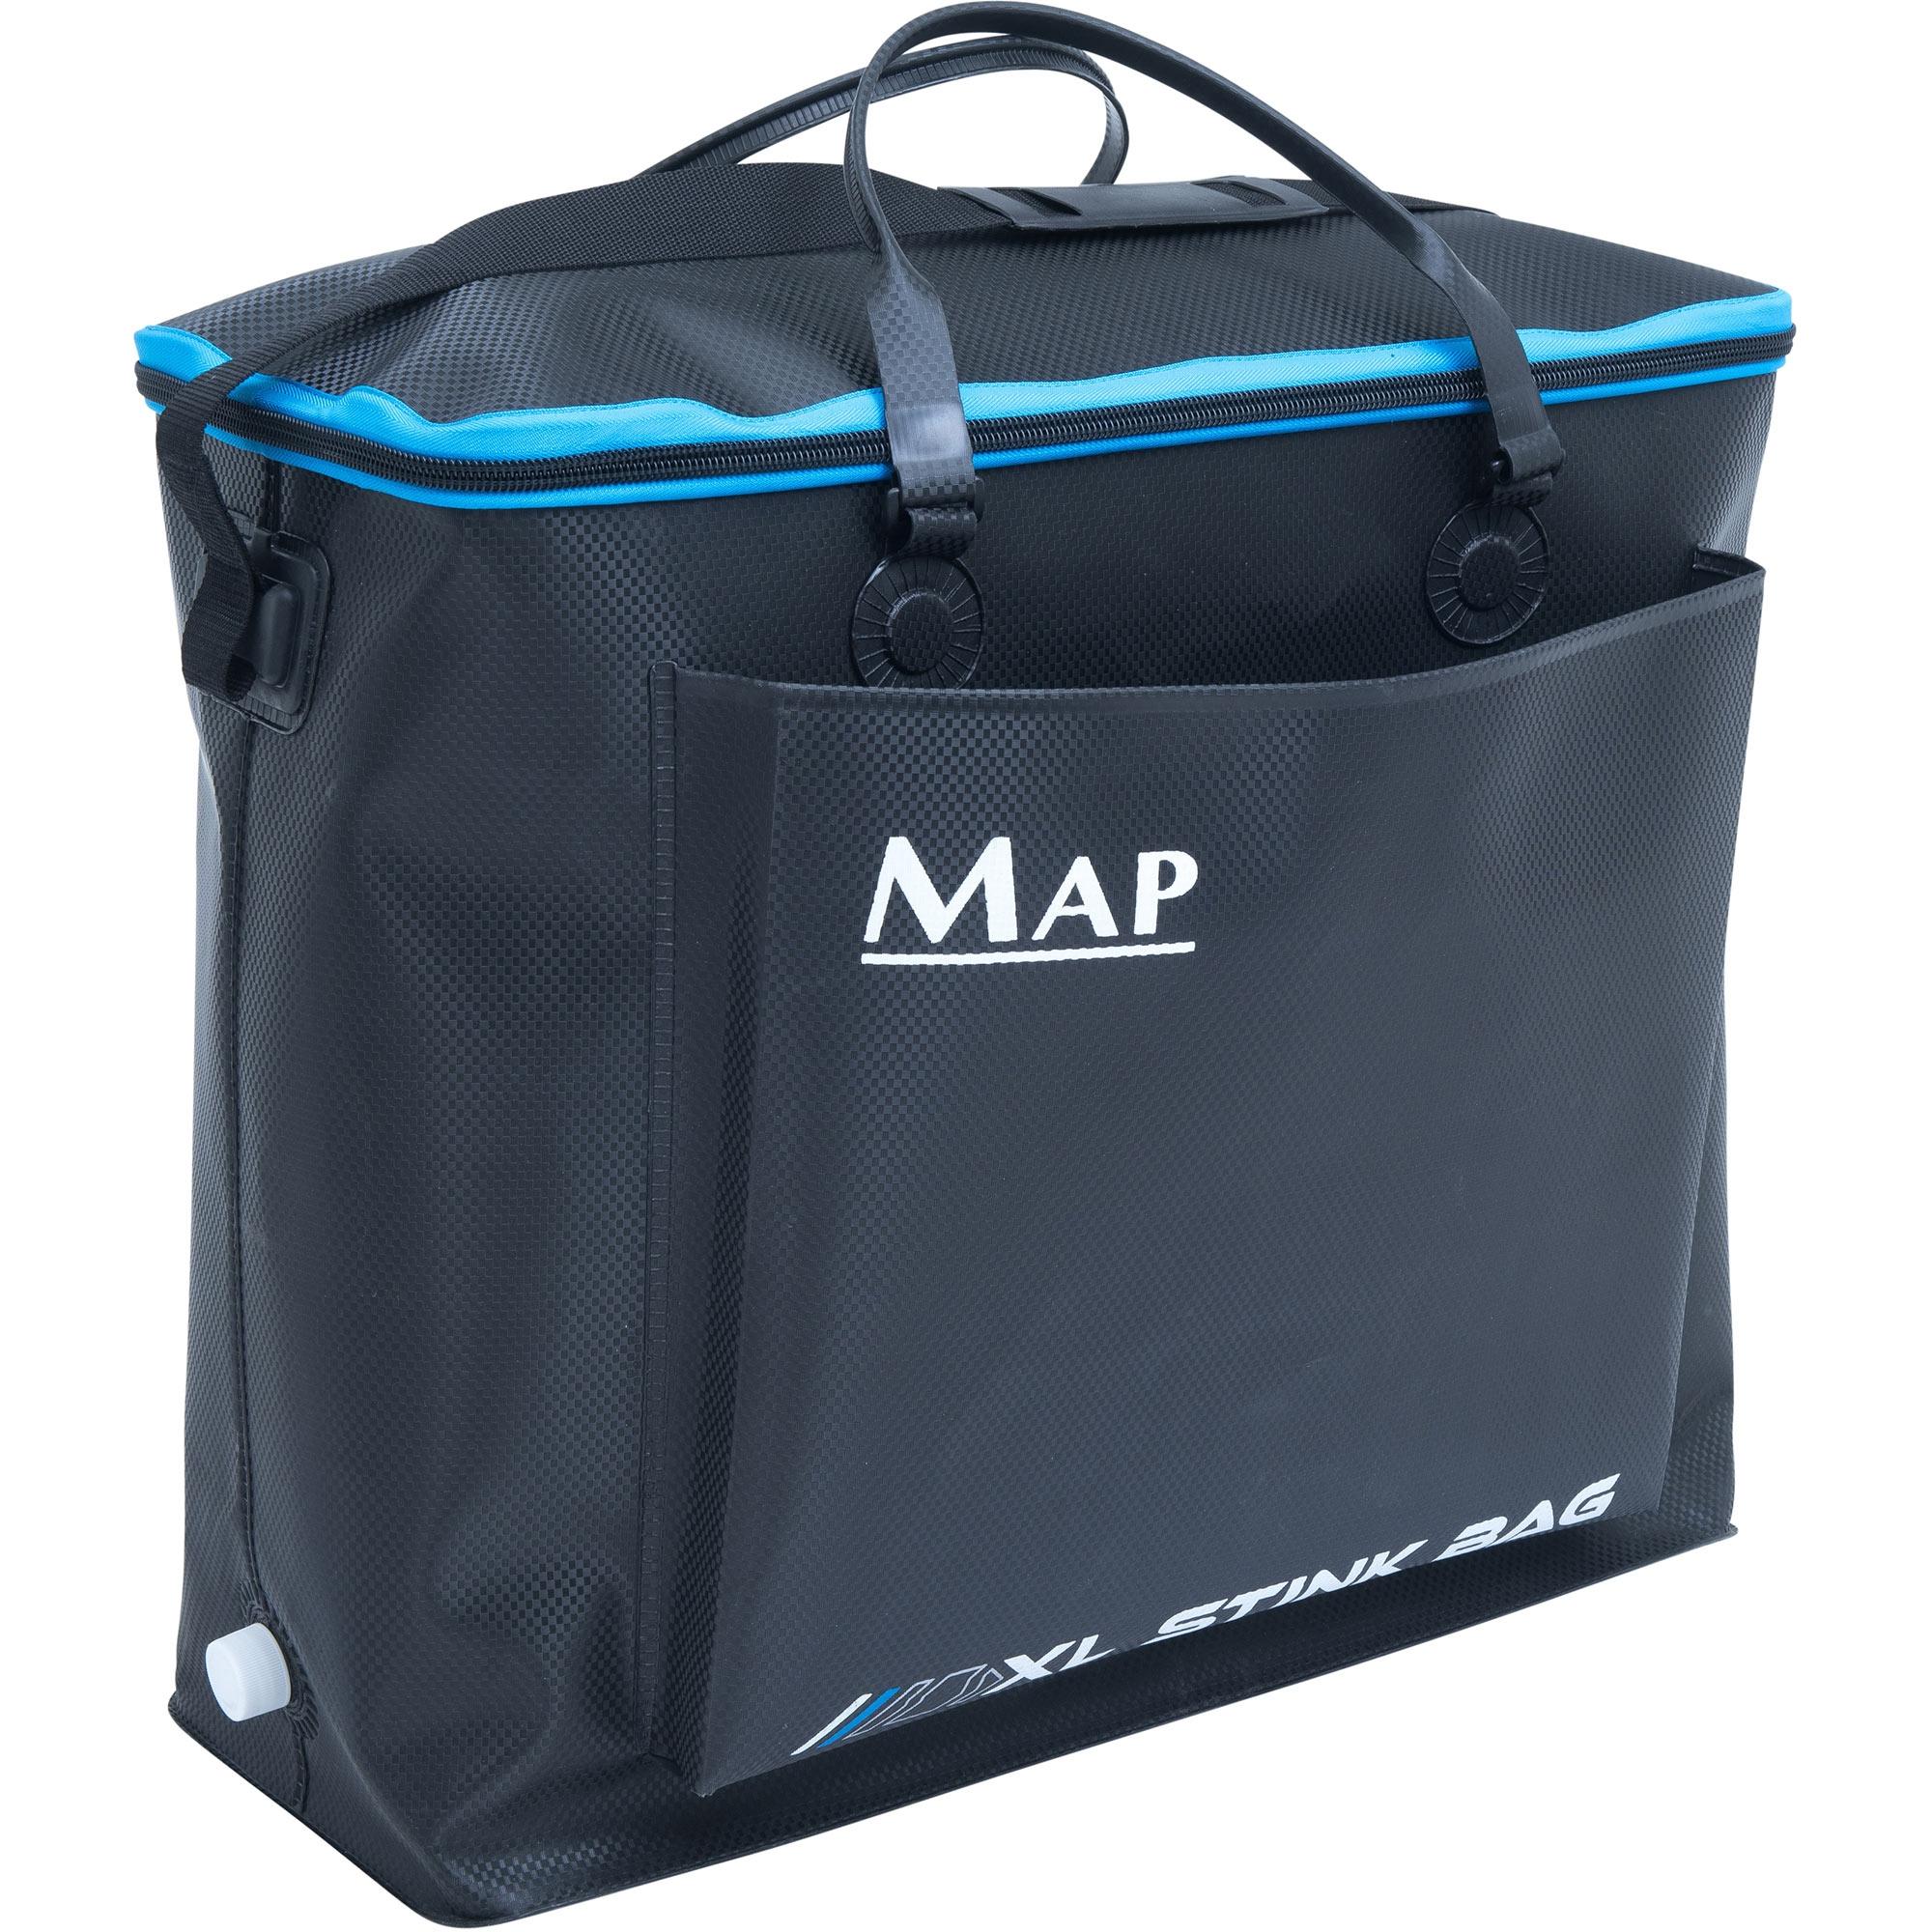 Borsa porta nassa XL Seal System MAP (60x52x26cm)